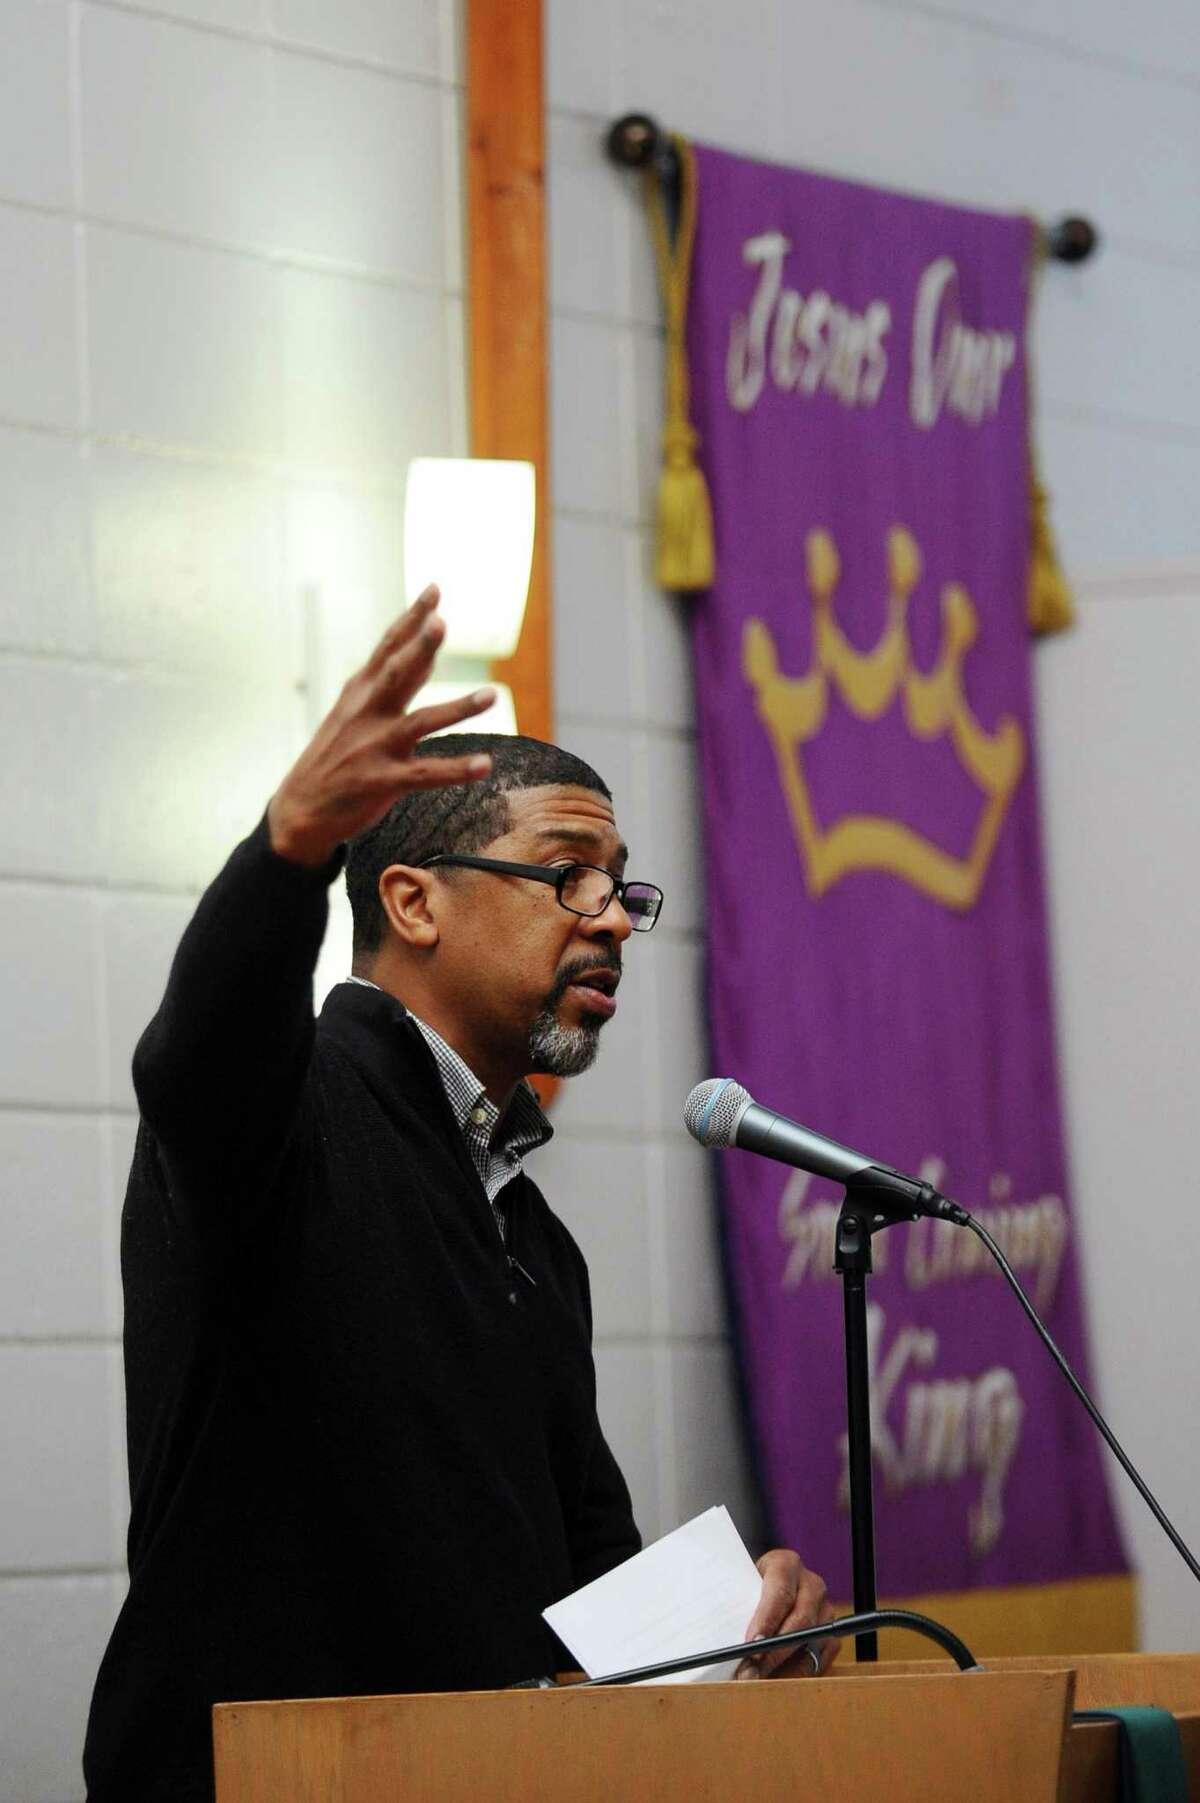 Al Thomas speaks inside Bethel AME Church on Monday, Jan. 16, 2017.